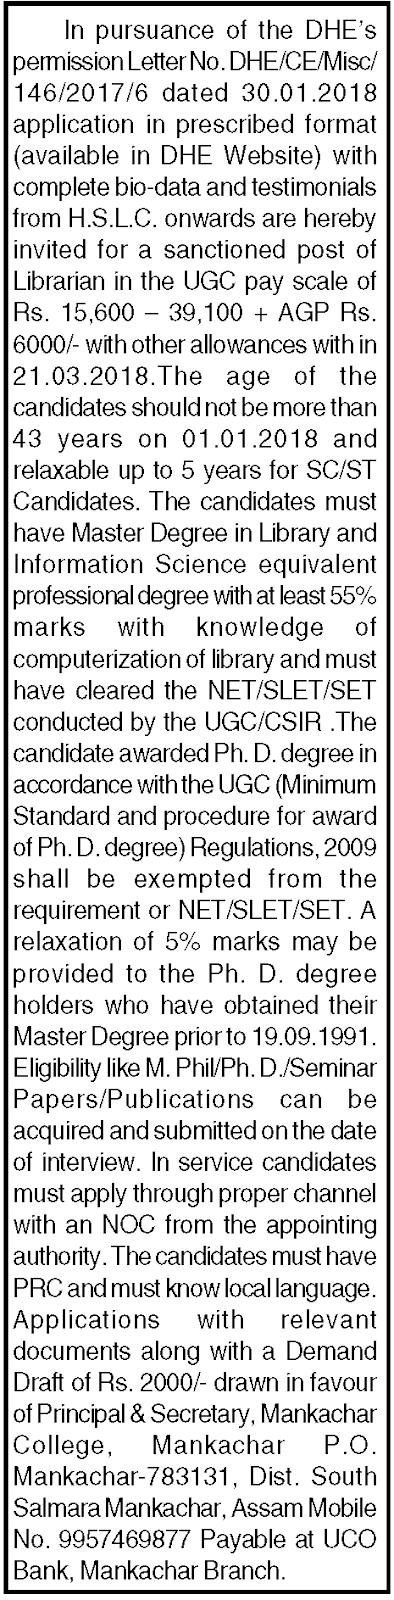 Mankachar College, Mankachar, Assam Recruitment for the post of Librarian